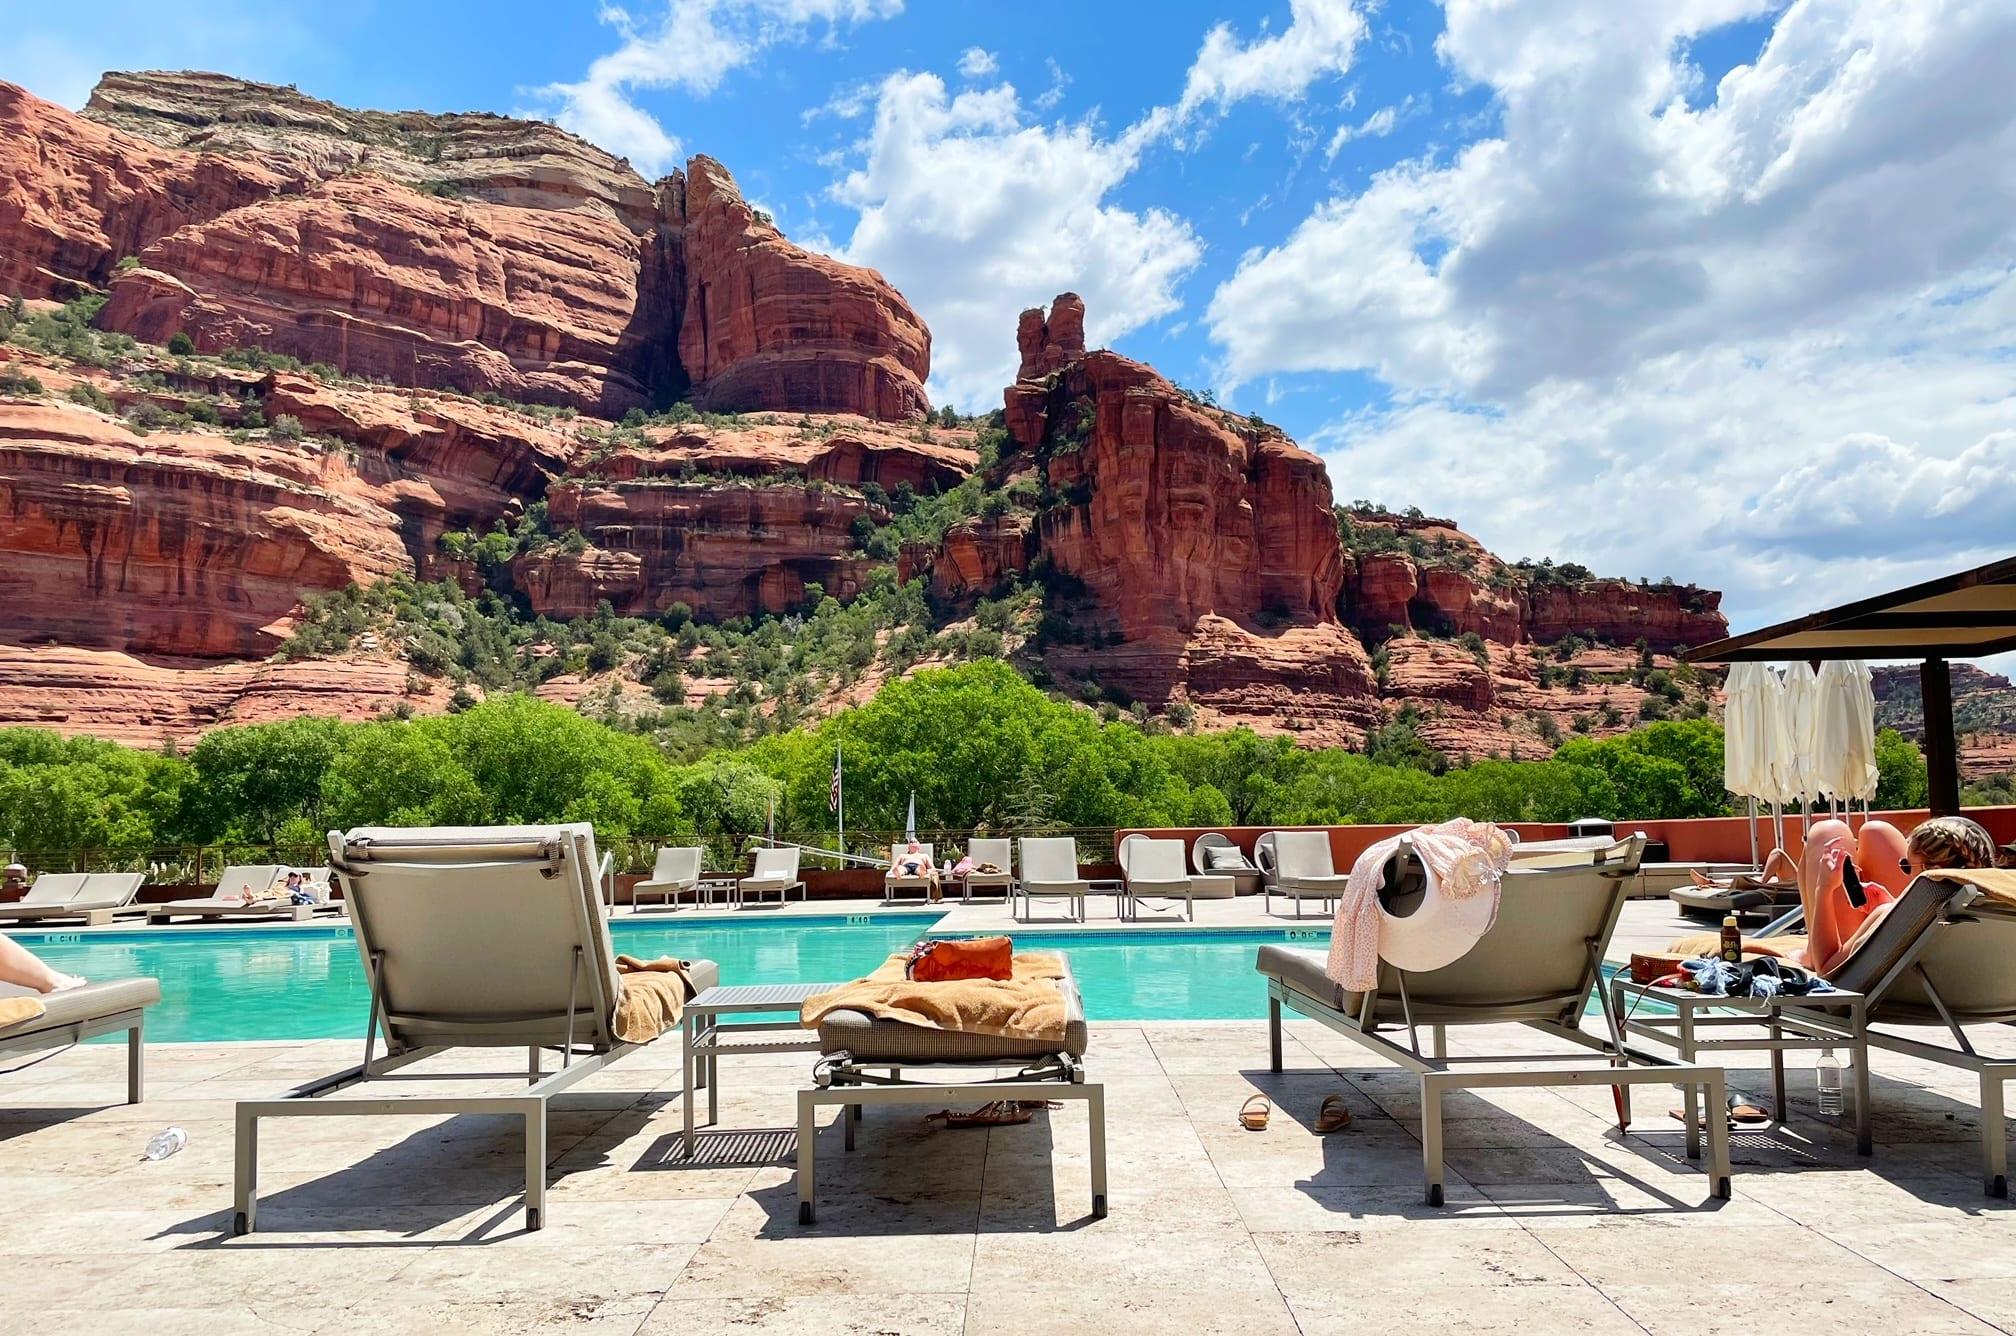 ETW #99 Luxury Road Trip Through the American Southwest